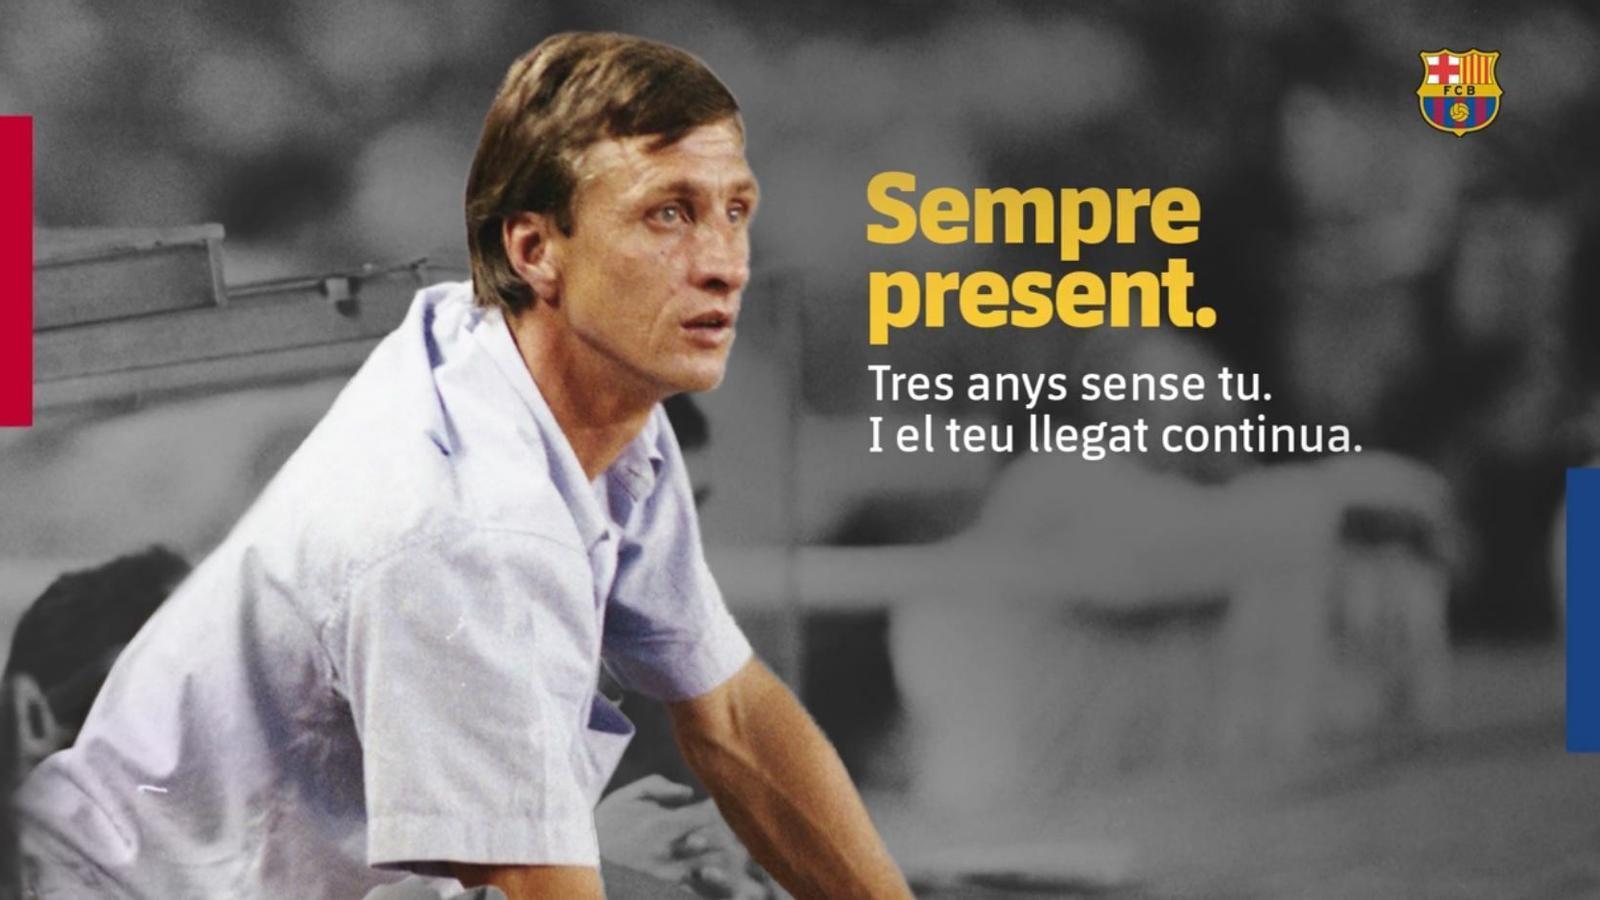 Johan Cruyff, el llegat continua